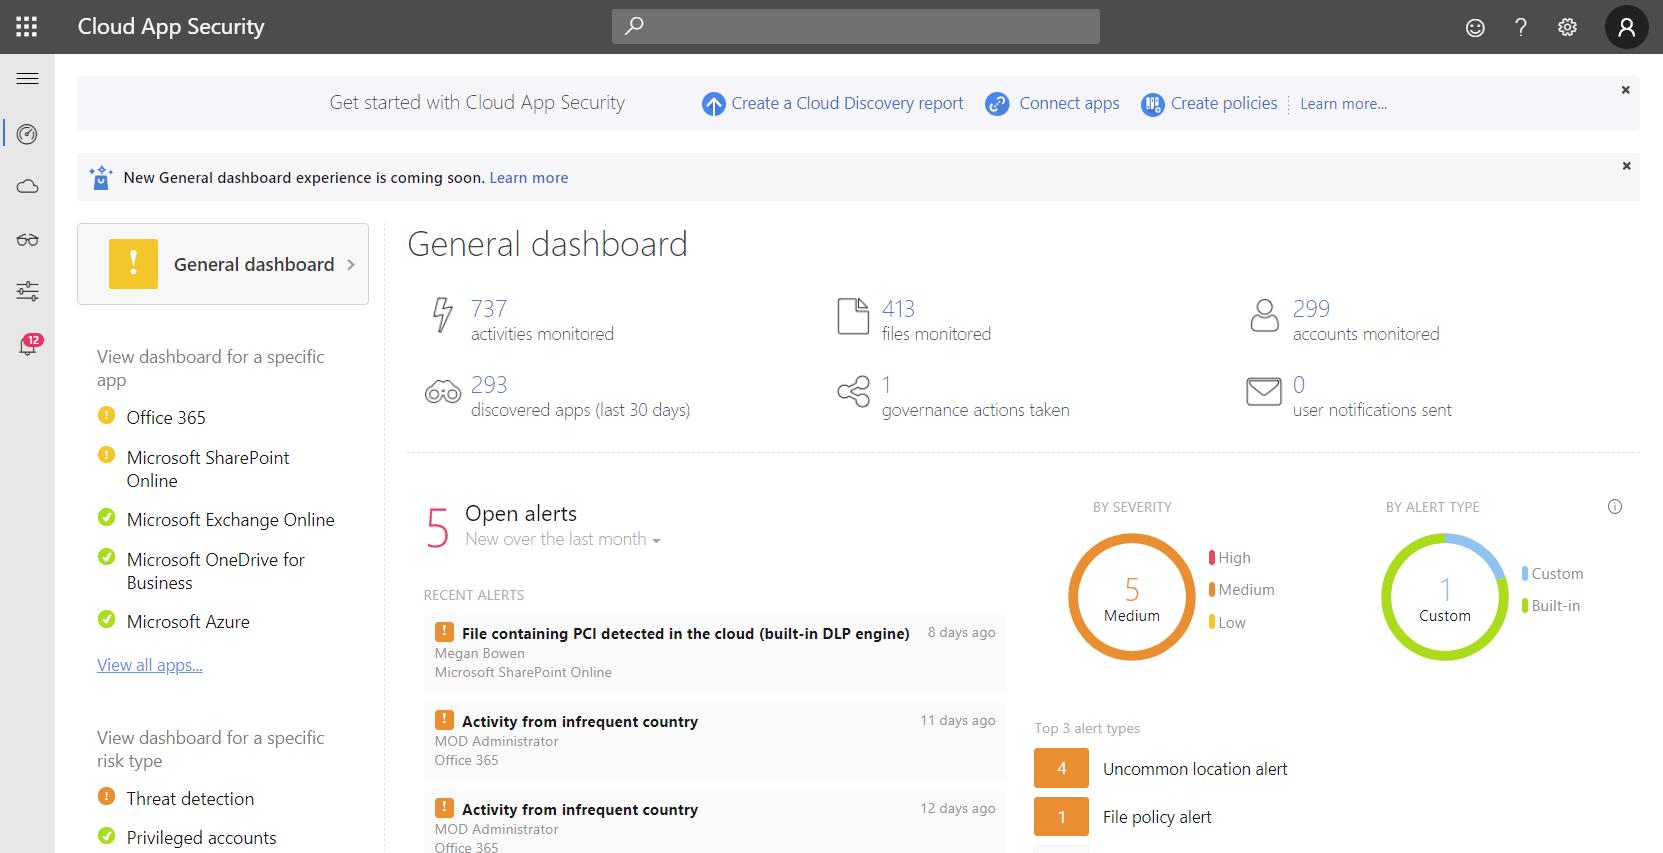 Microsoft 365 Cloud app security dashboard